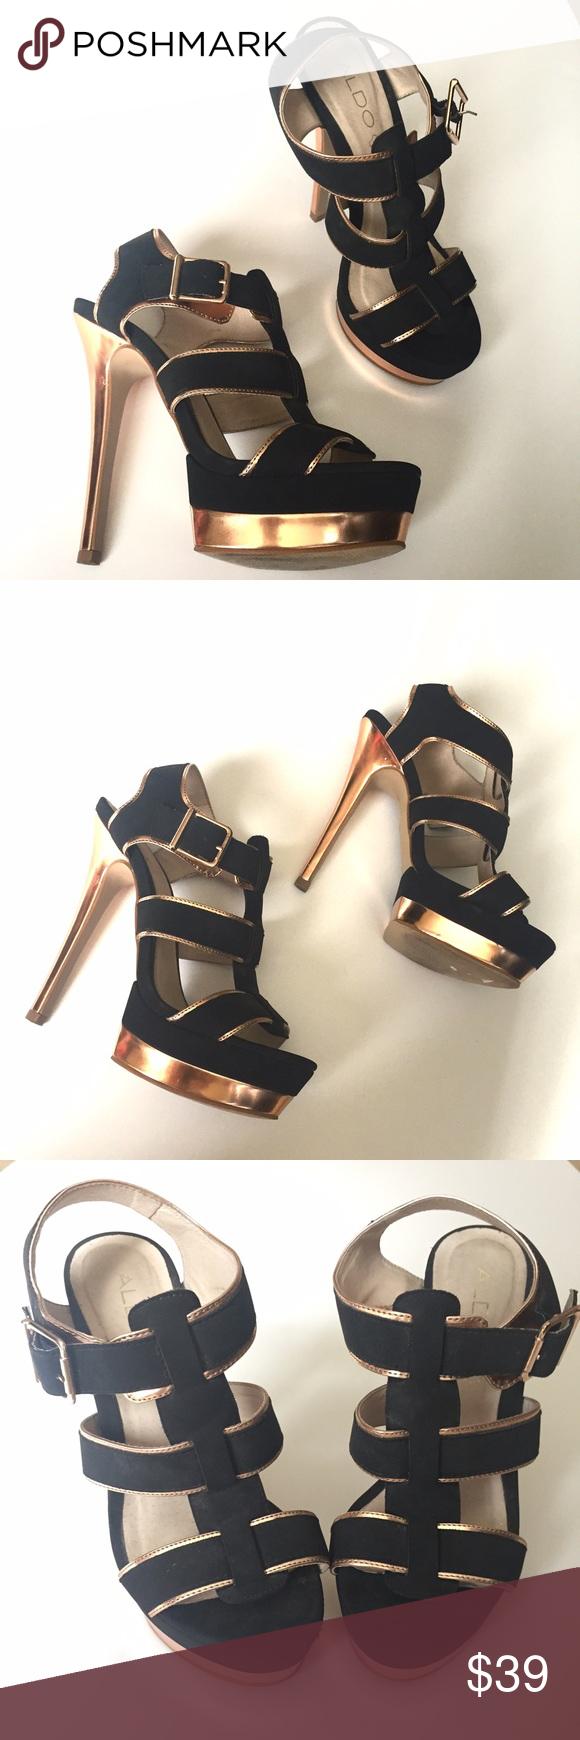 10f07643235 ALDO black and rose gold strappy platform heels ALDO strappy heeled ...